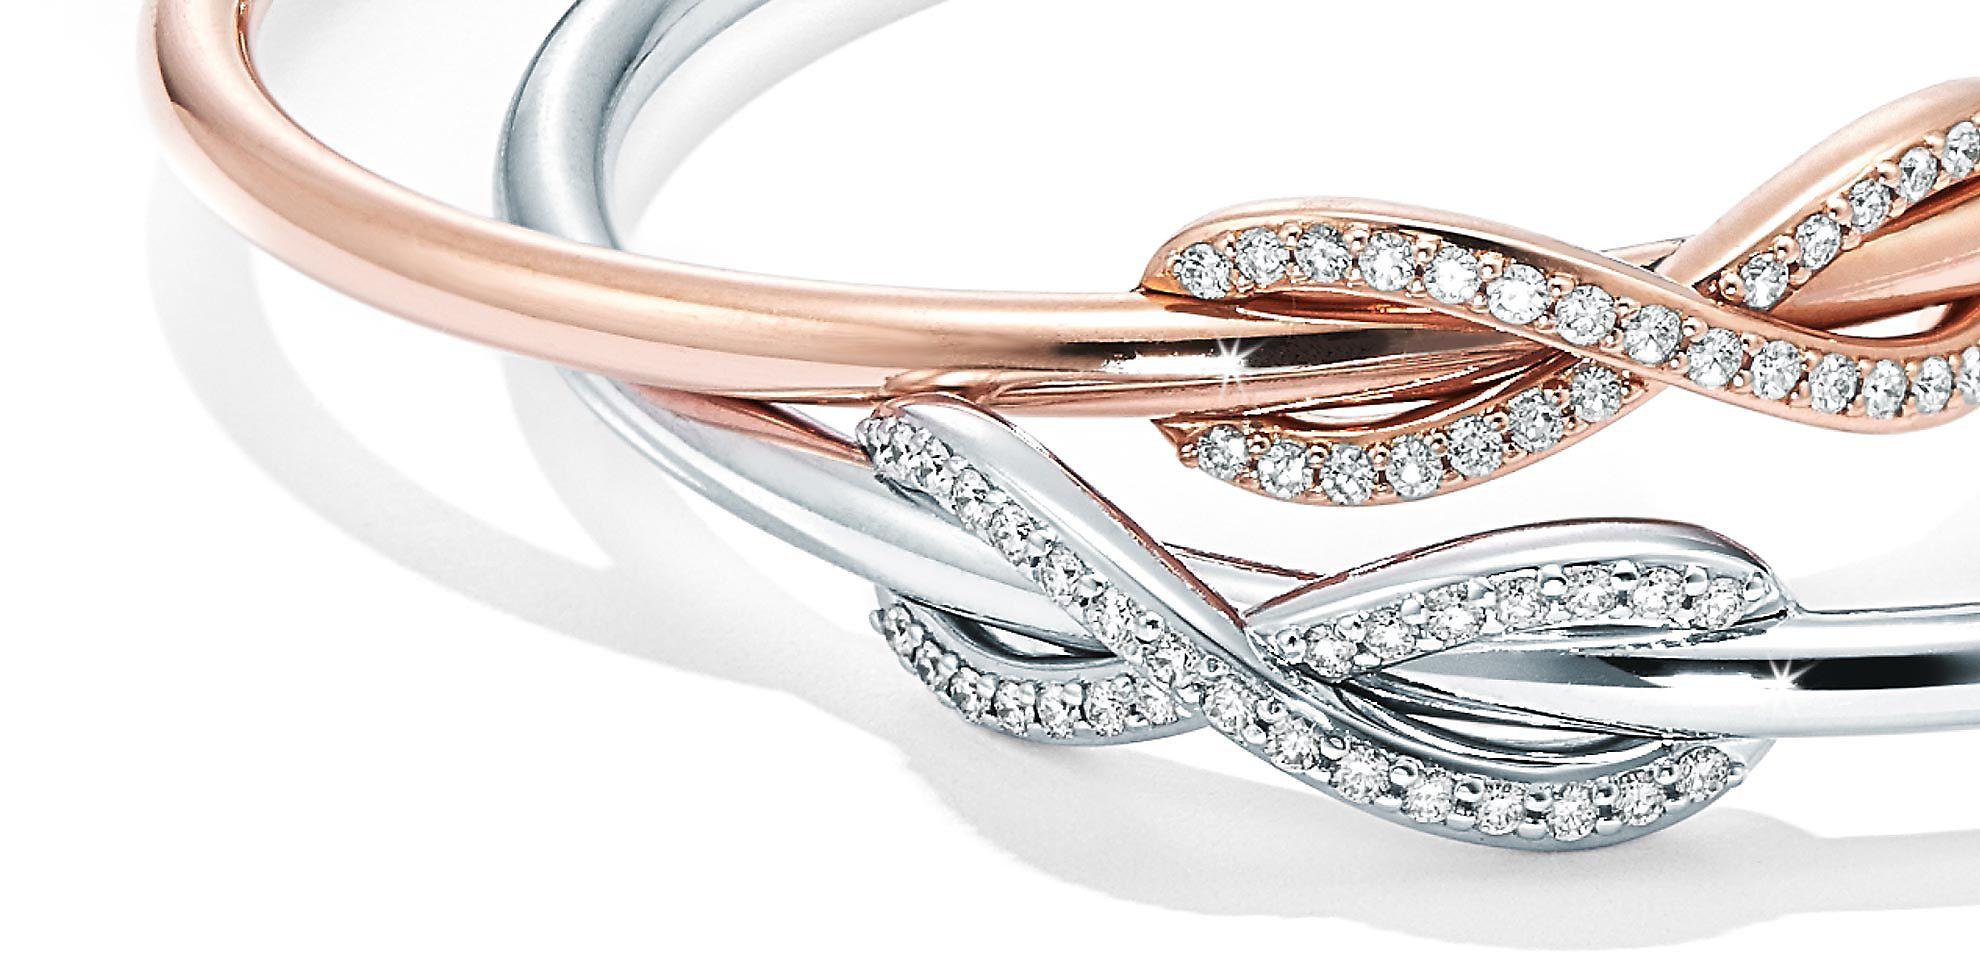 Infinity Jewellery Infinity Necklaces Bracelets Rings